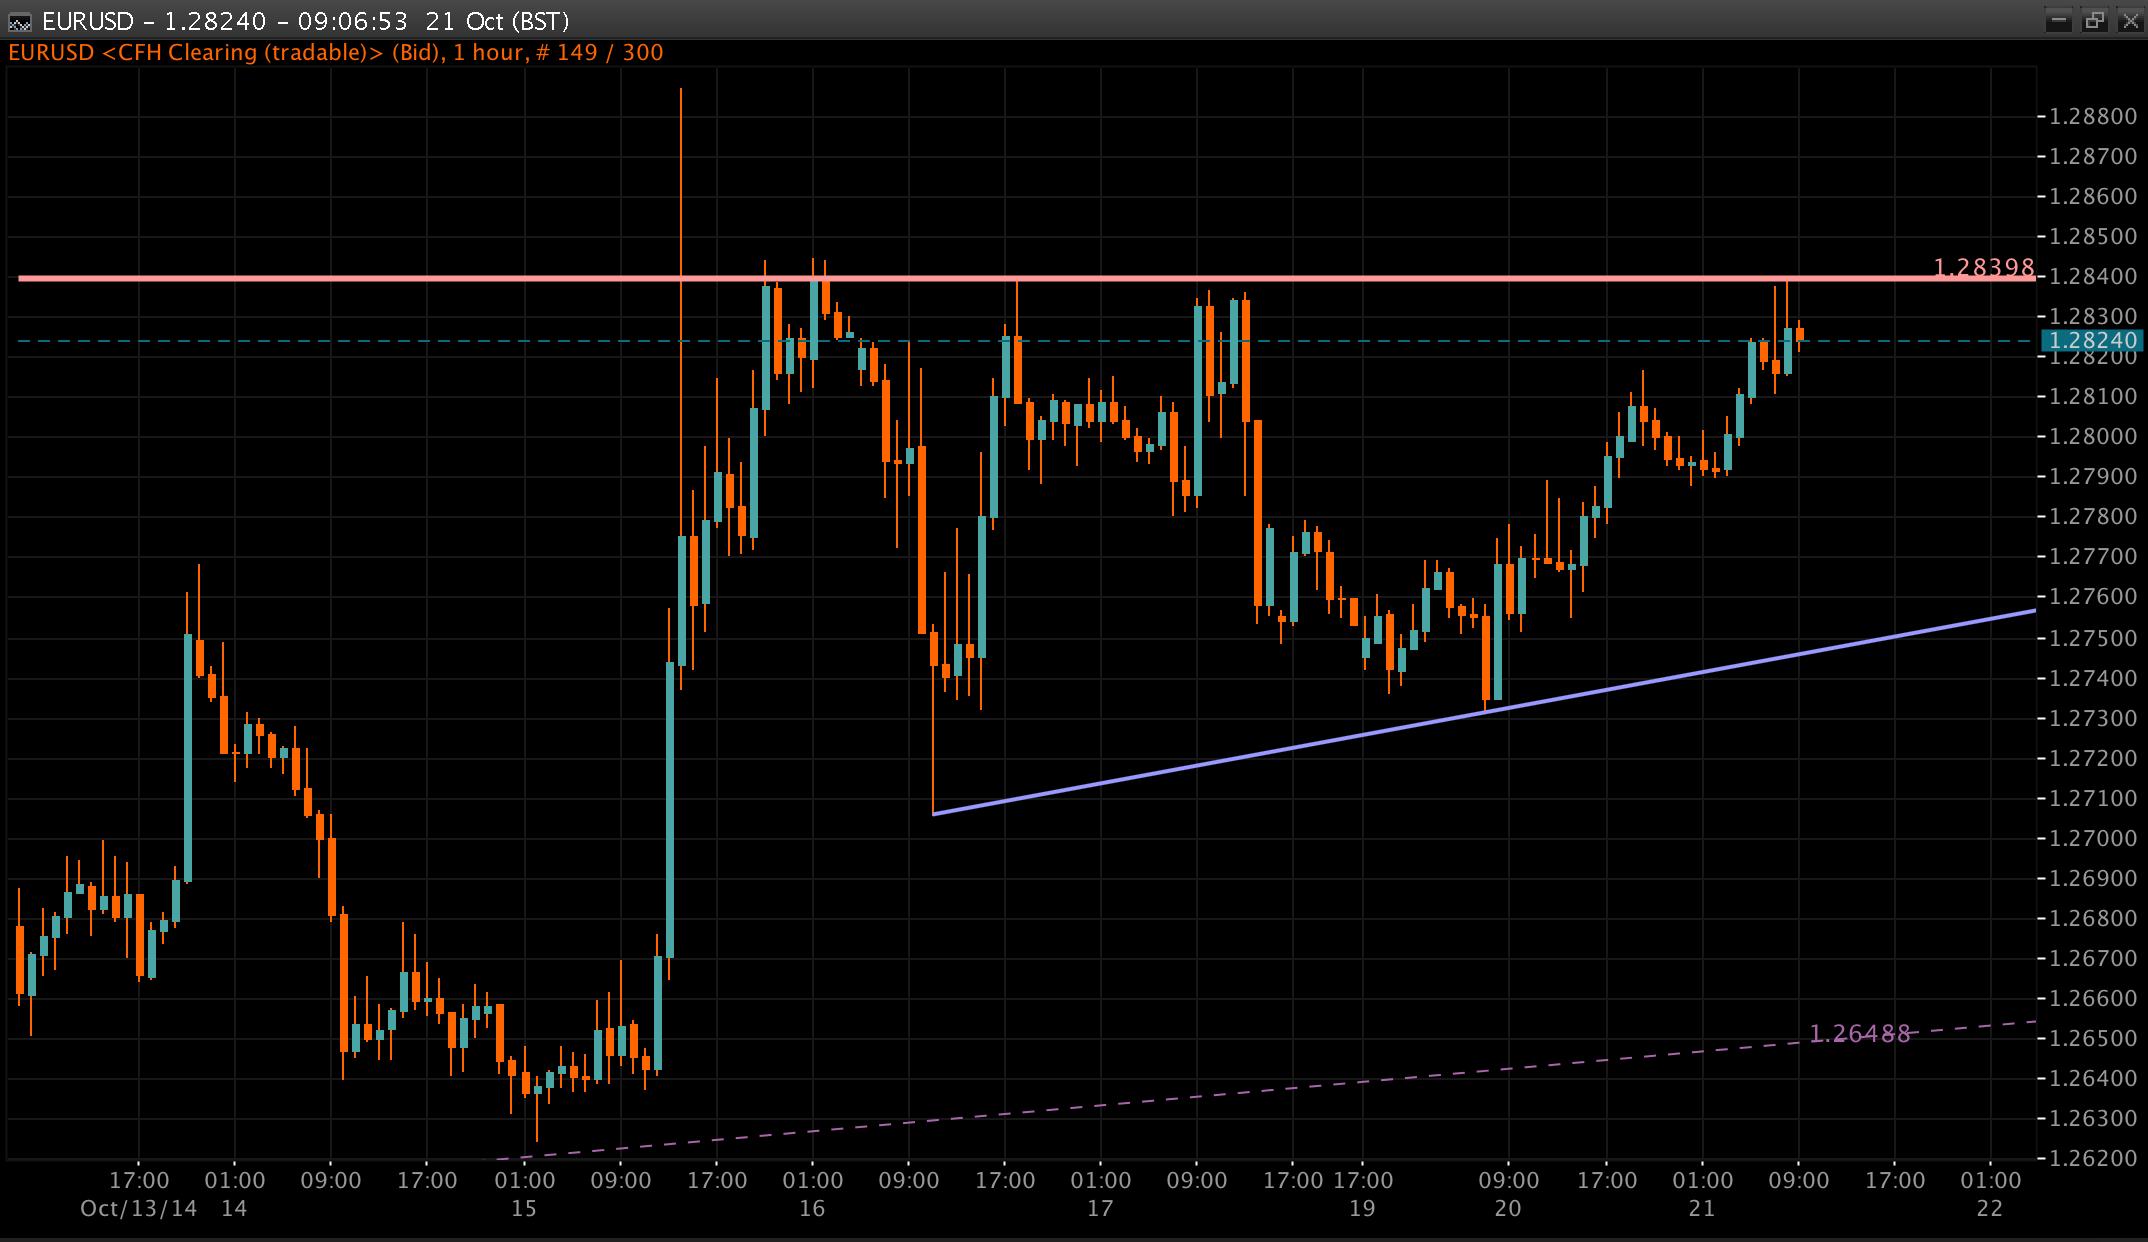 EUR/USD Chart 21 Oct 2014